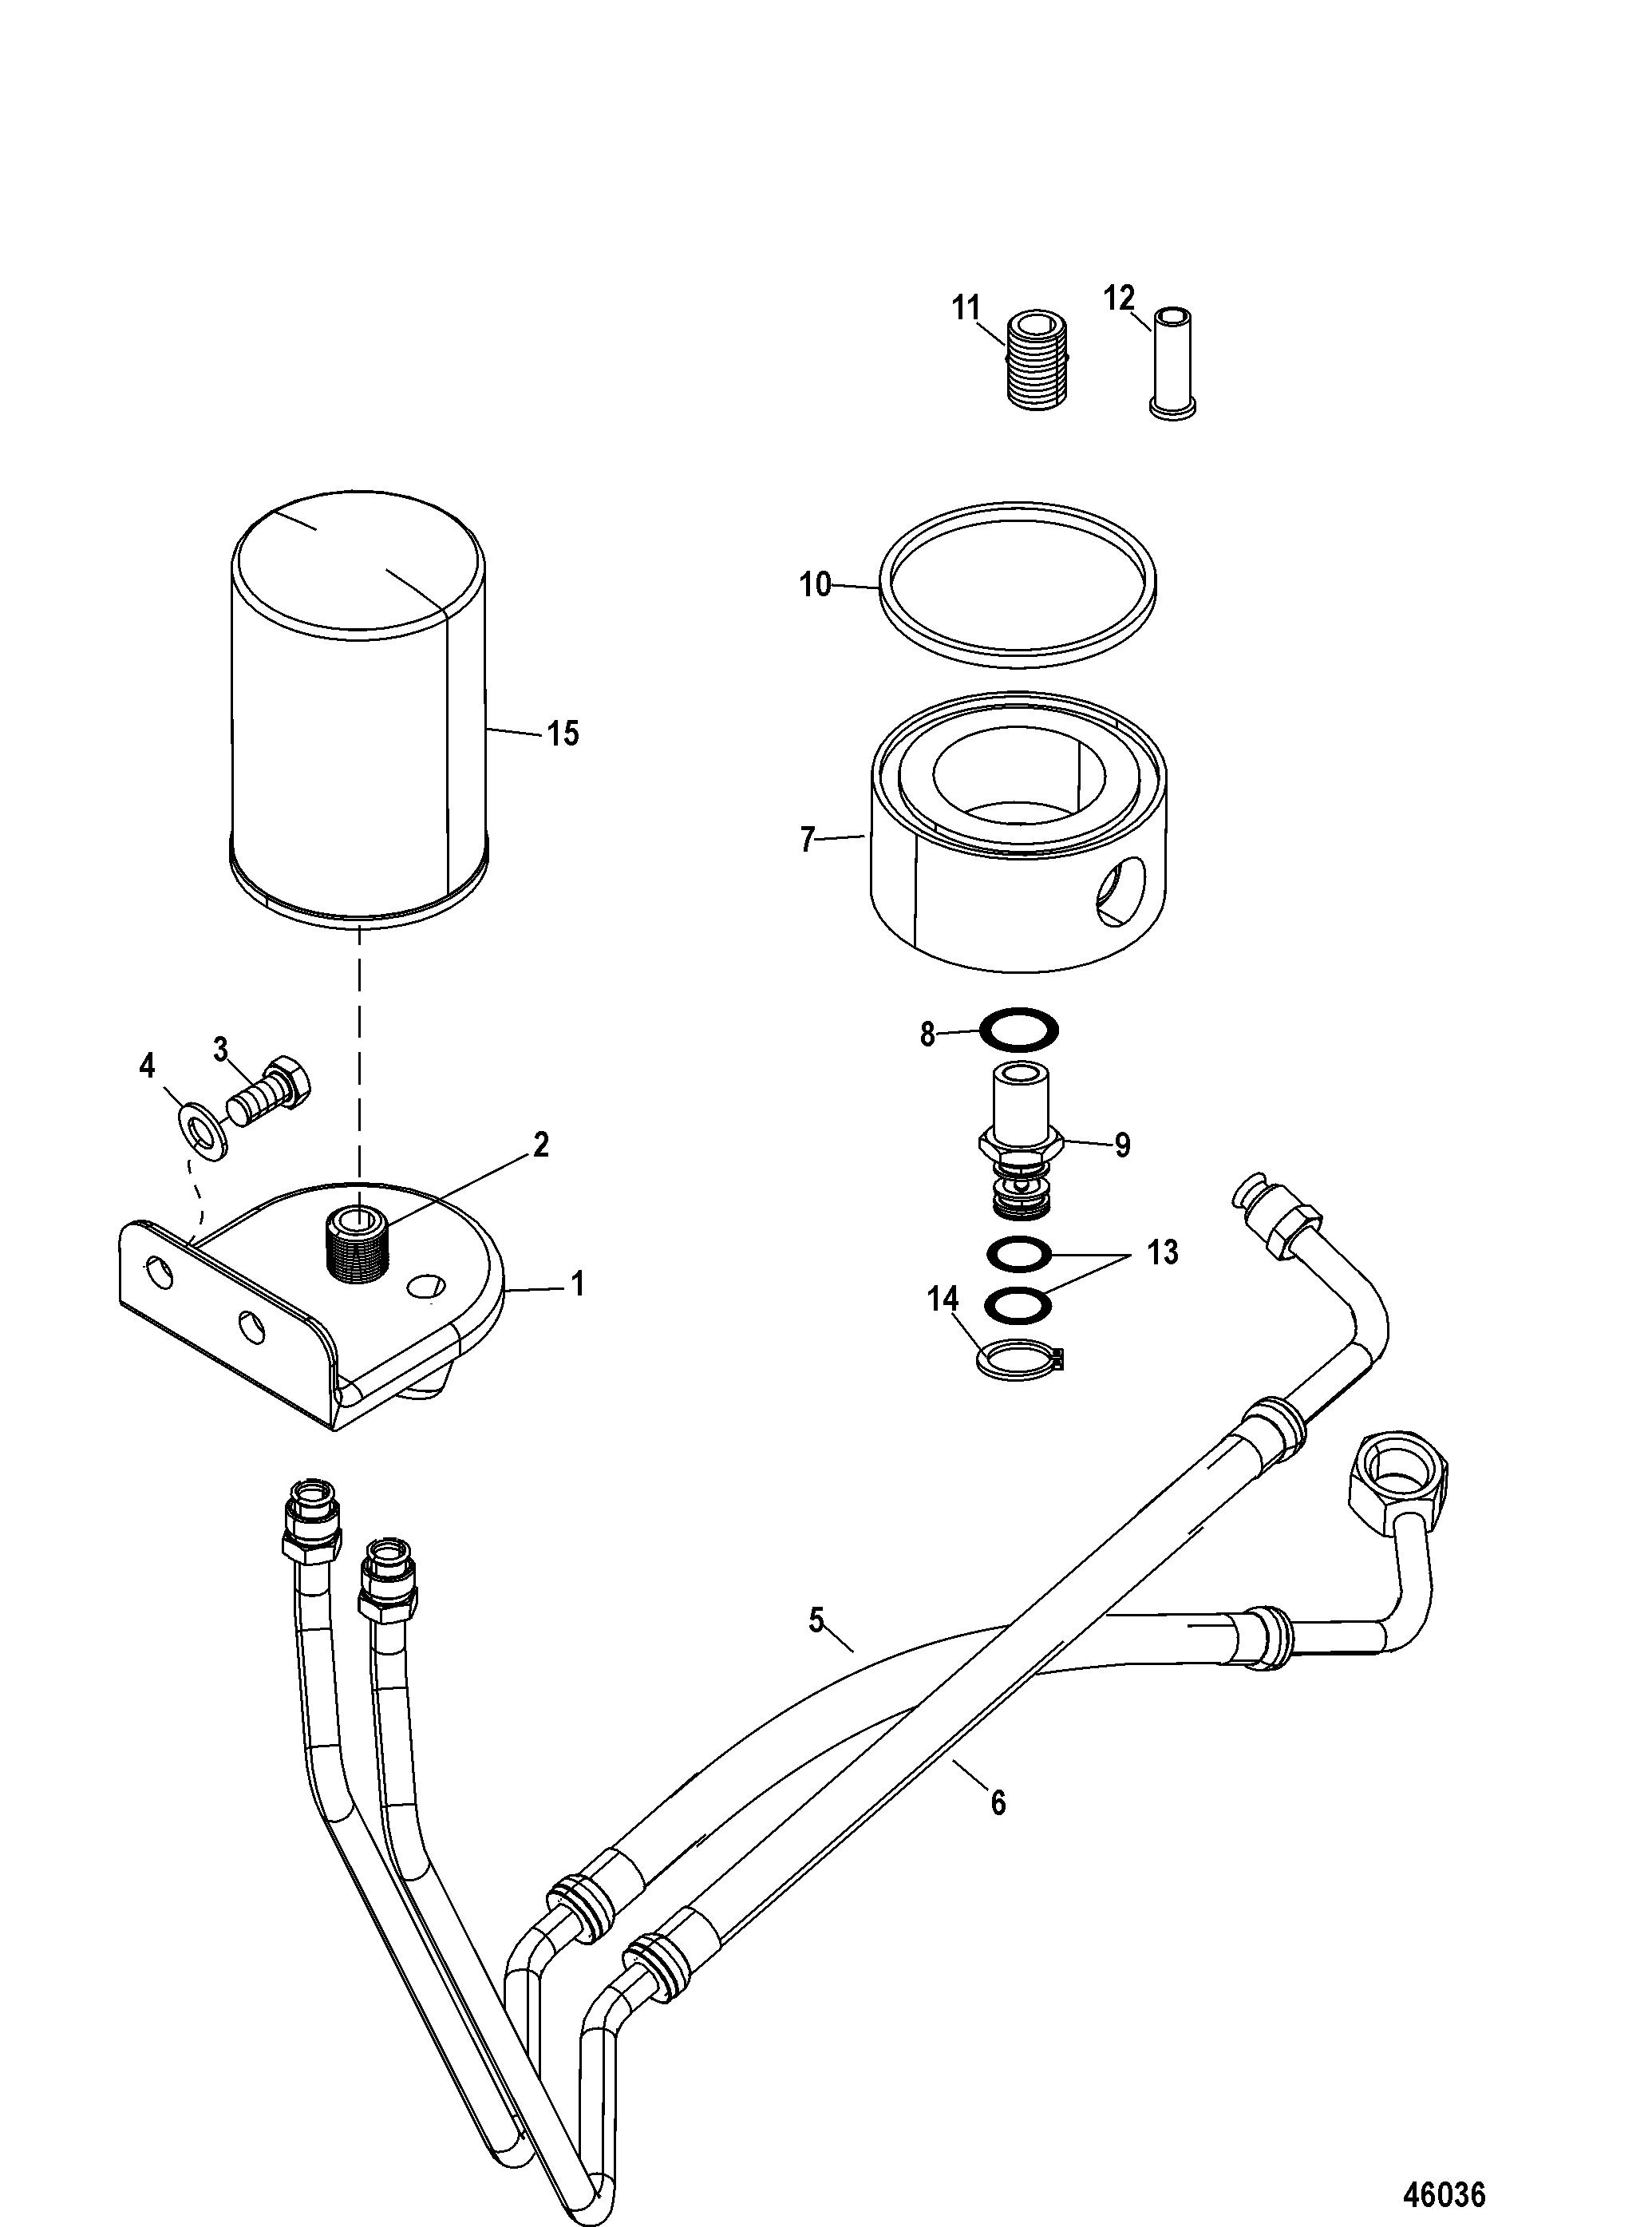 mercruiser firing order diagram marine wiring 350 mag mpi ignition get